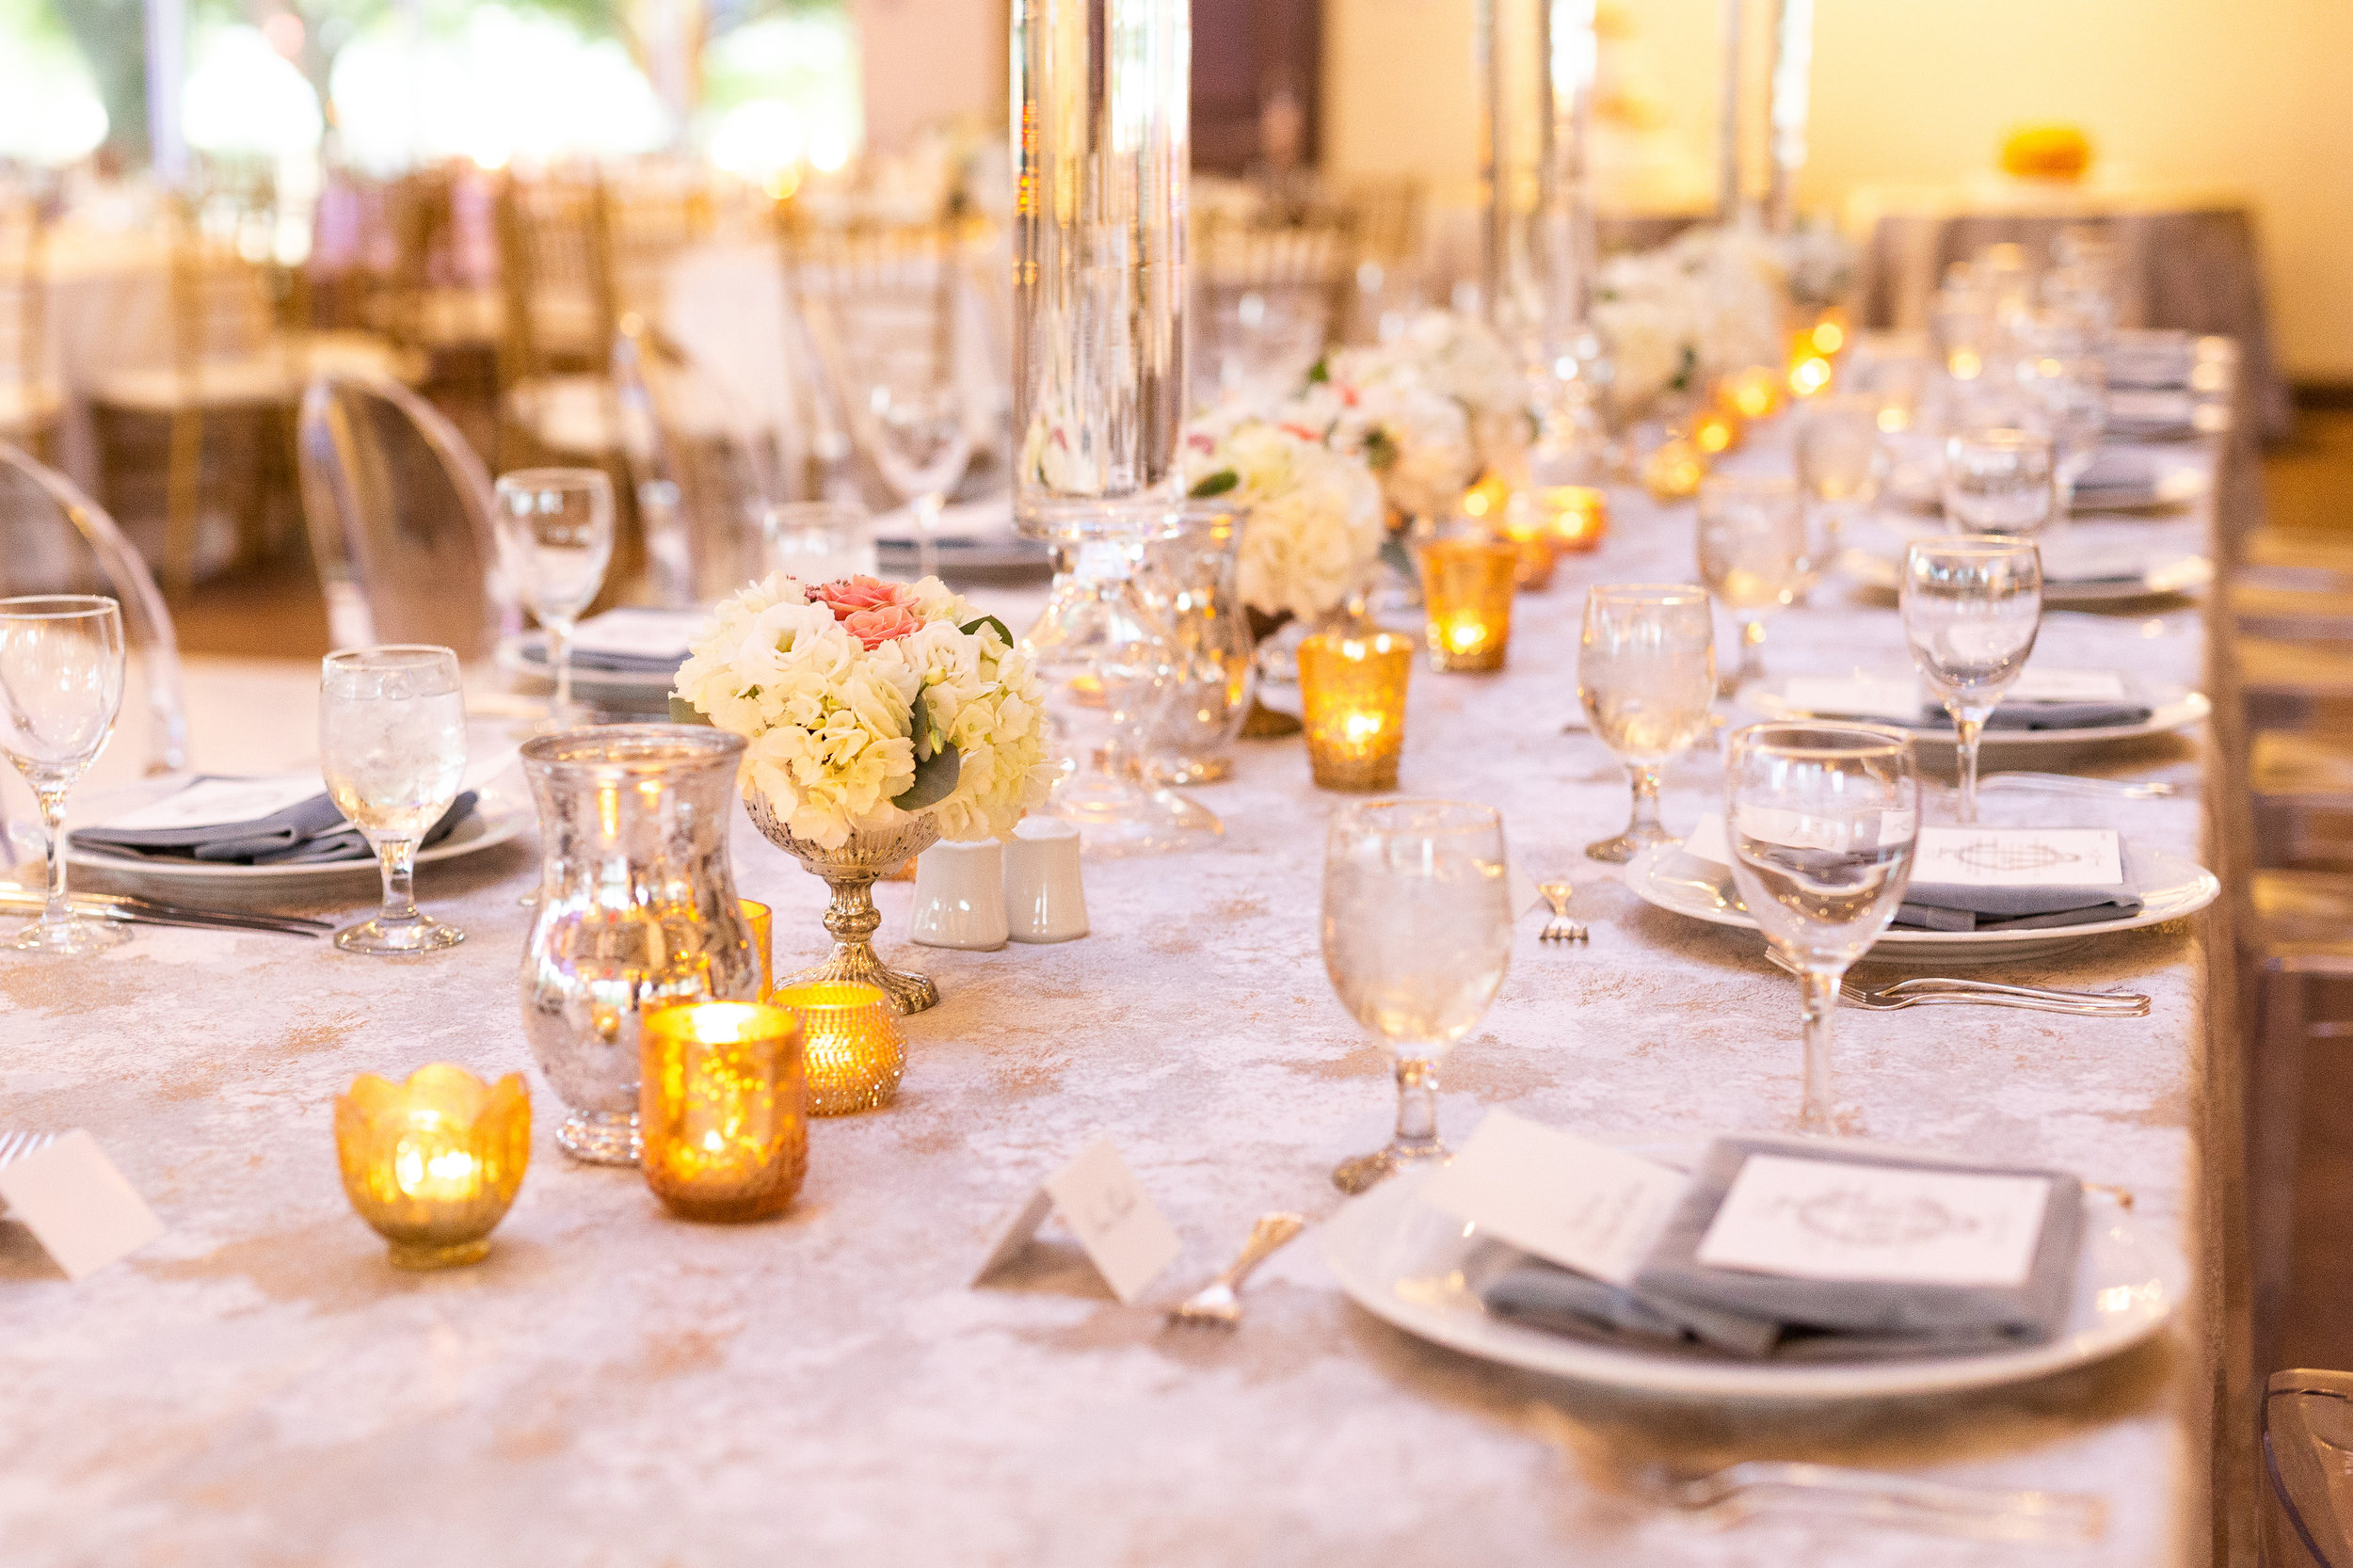 DFW Wedding Planner - Caroline + Jeff at The Four Seasons Hotel Wedding - Allday Events - 217.jpg